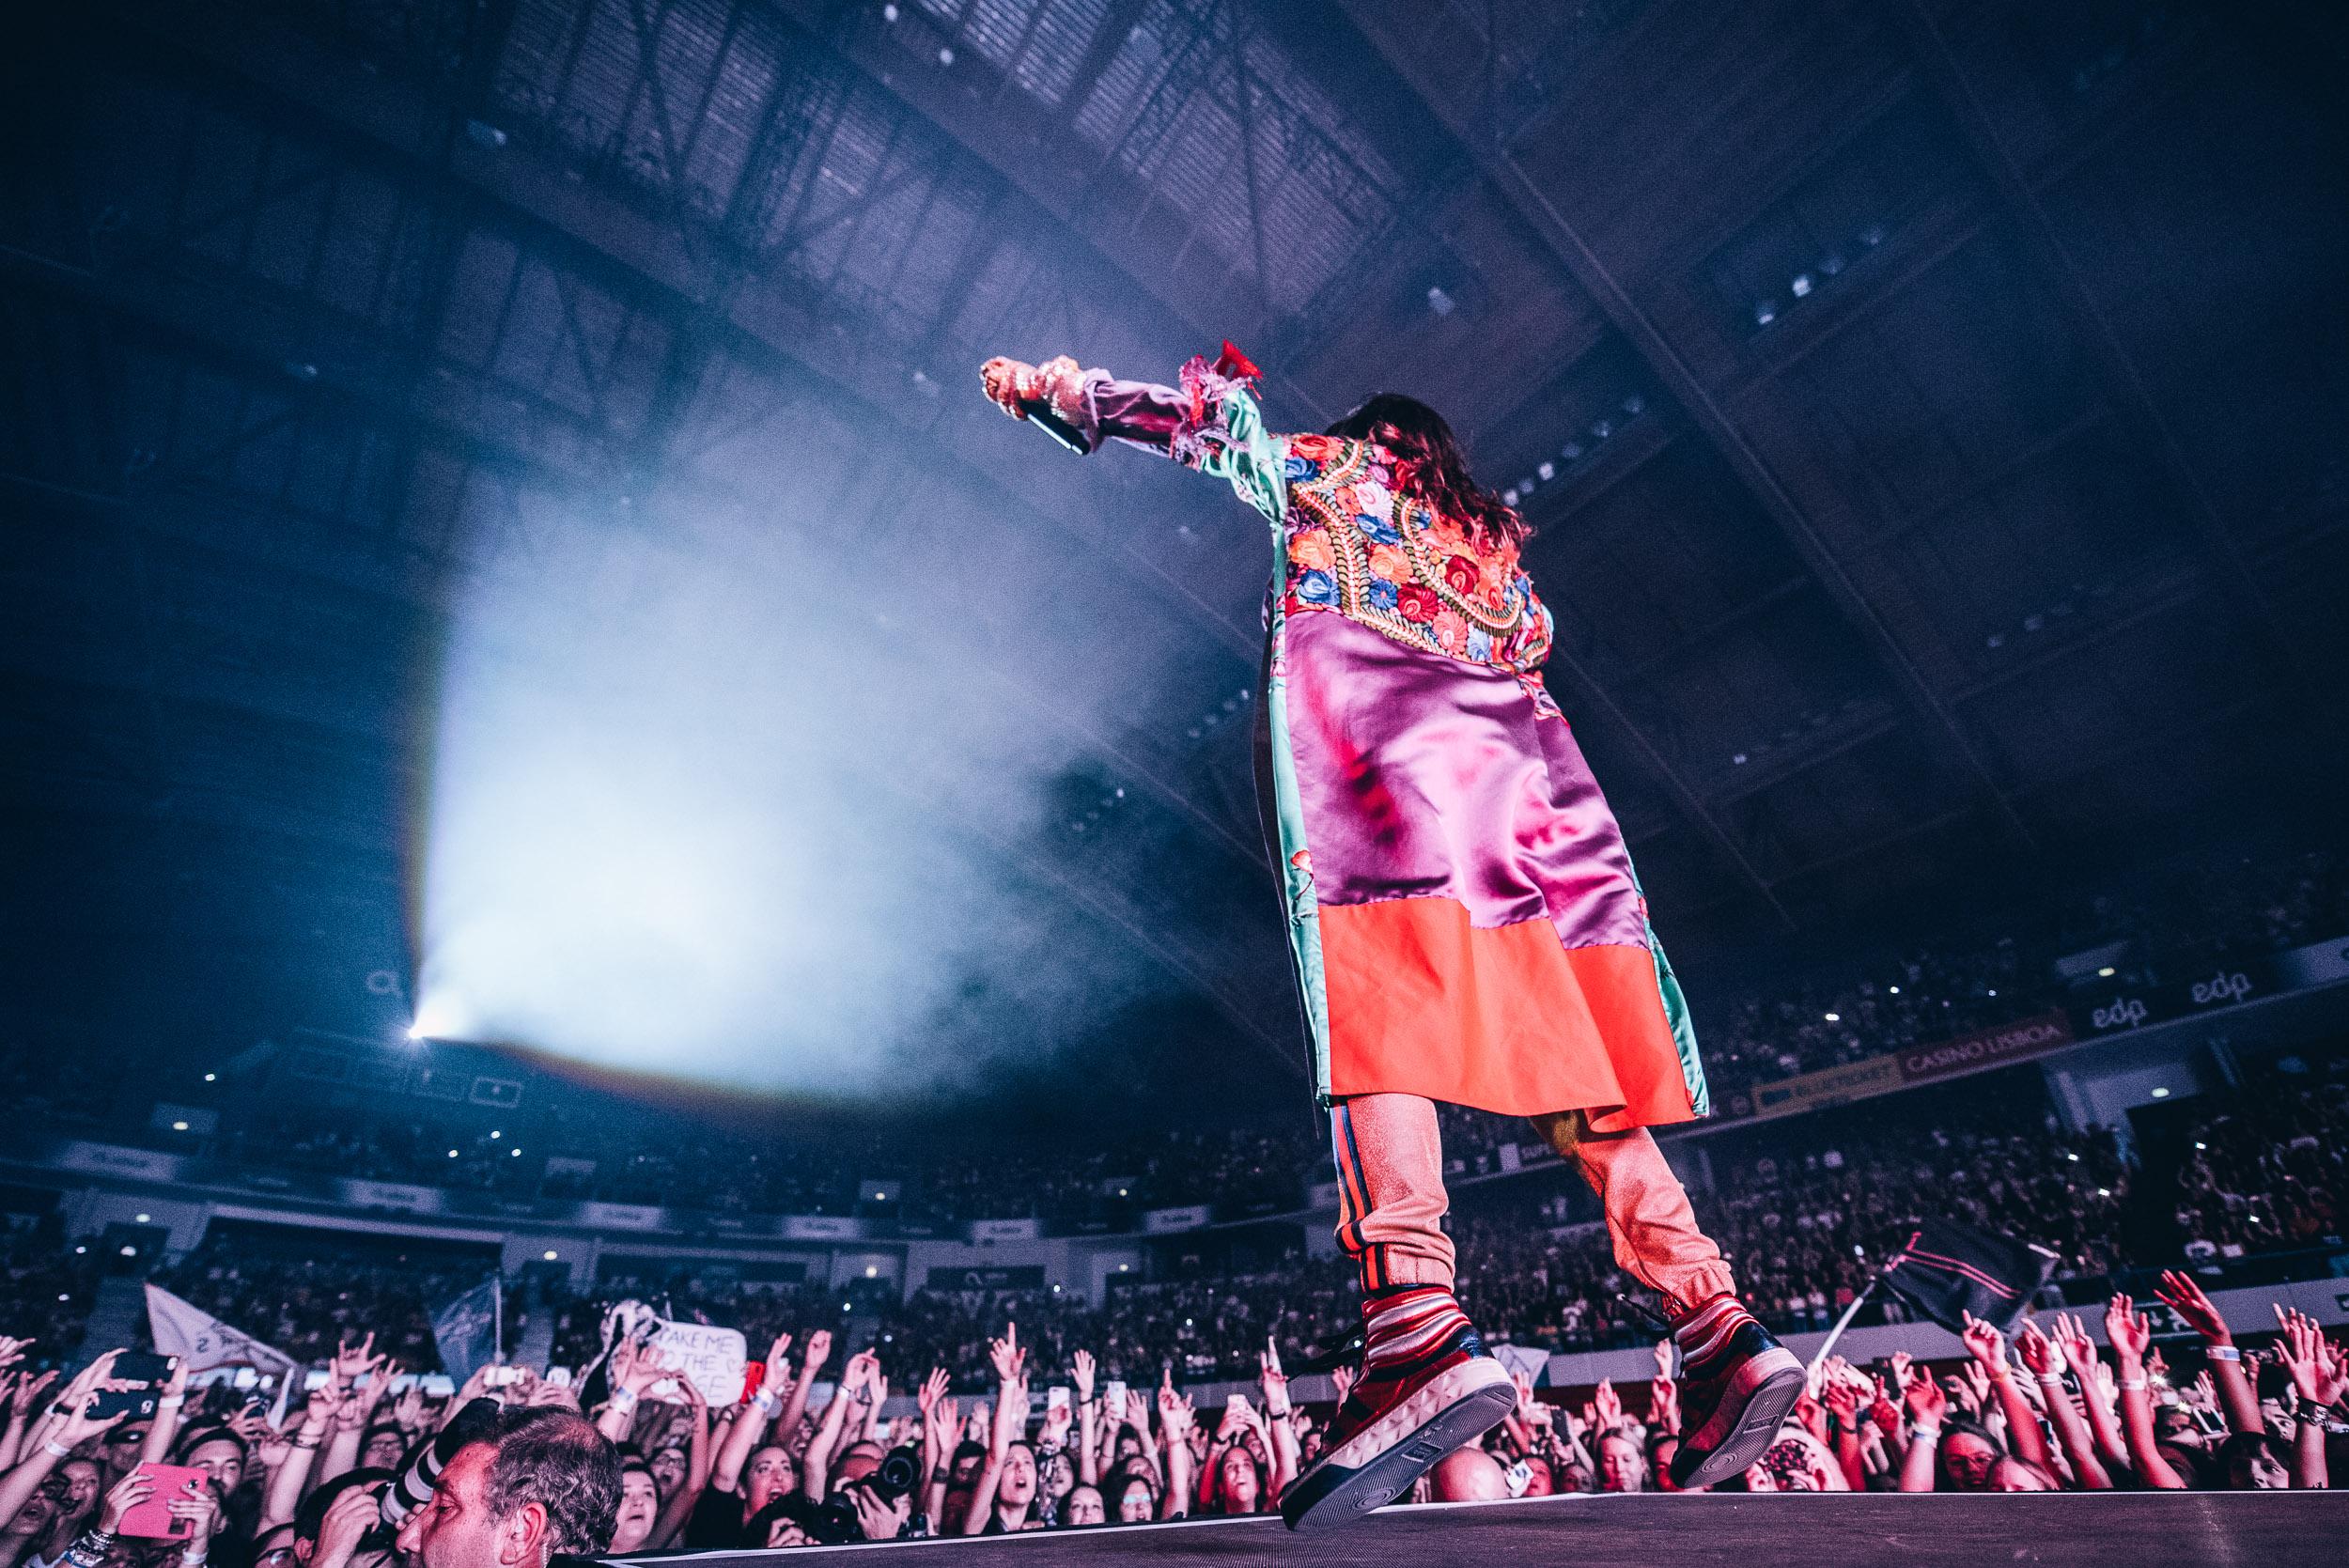 30 Seconds to Mars Altice Arena 20180912-293.jpg